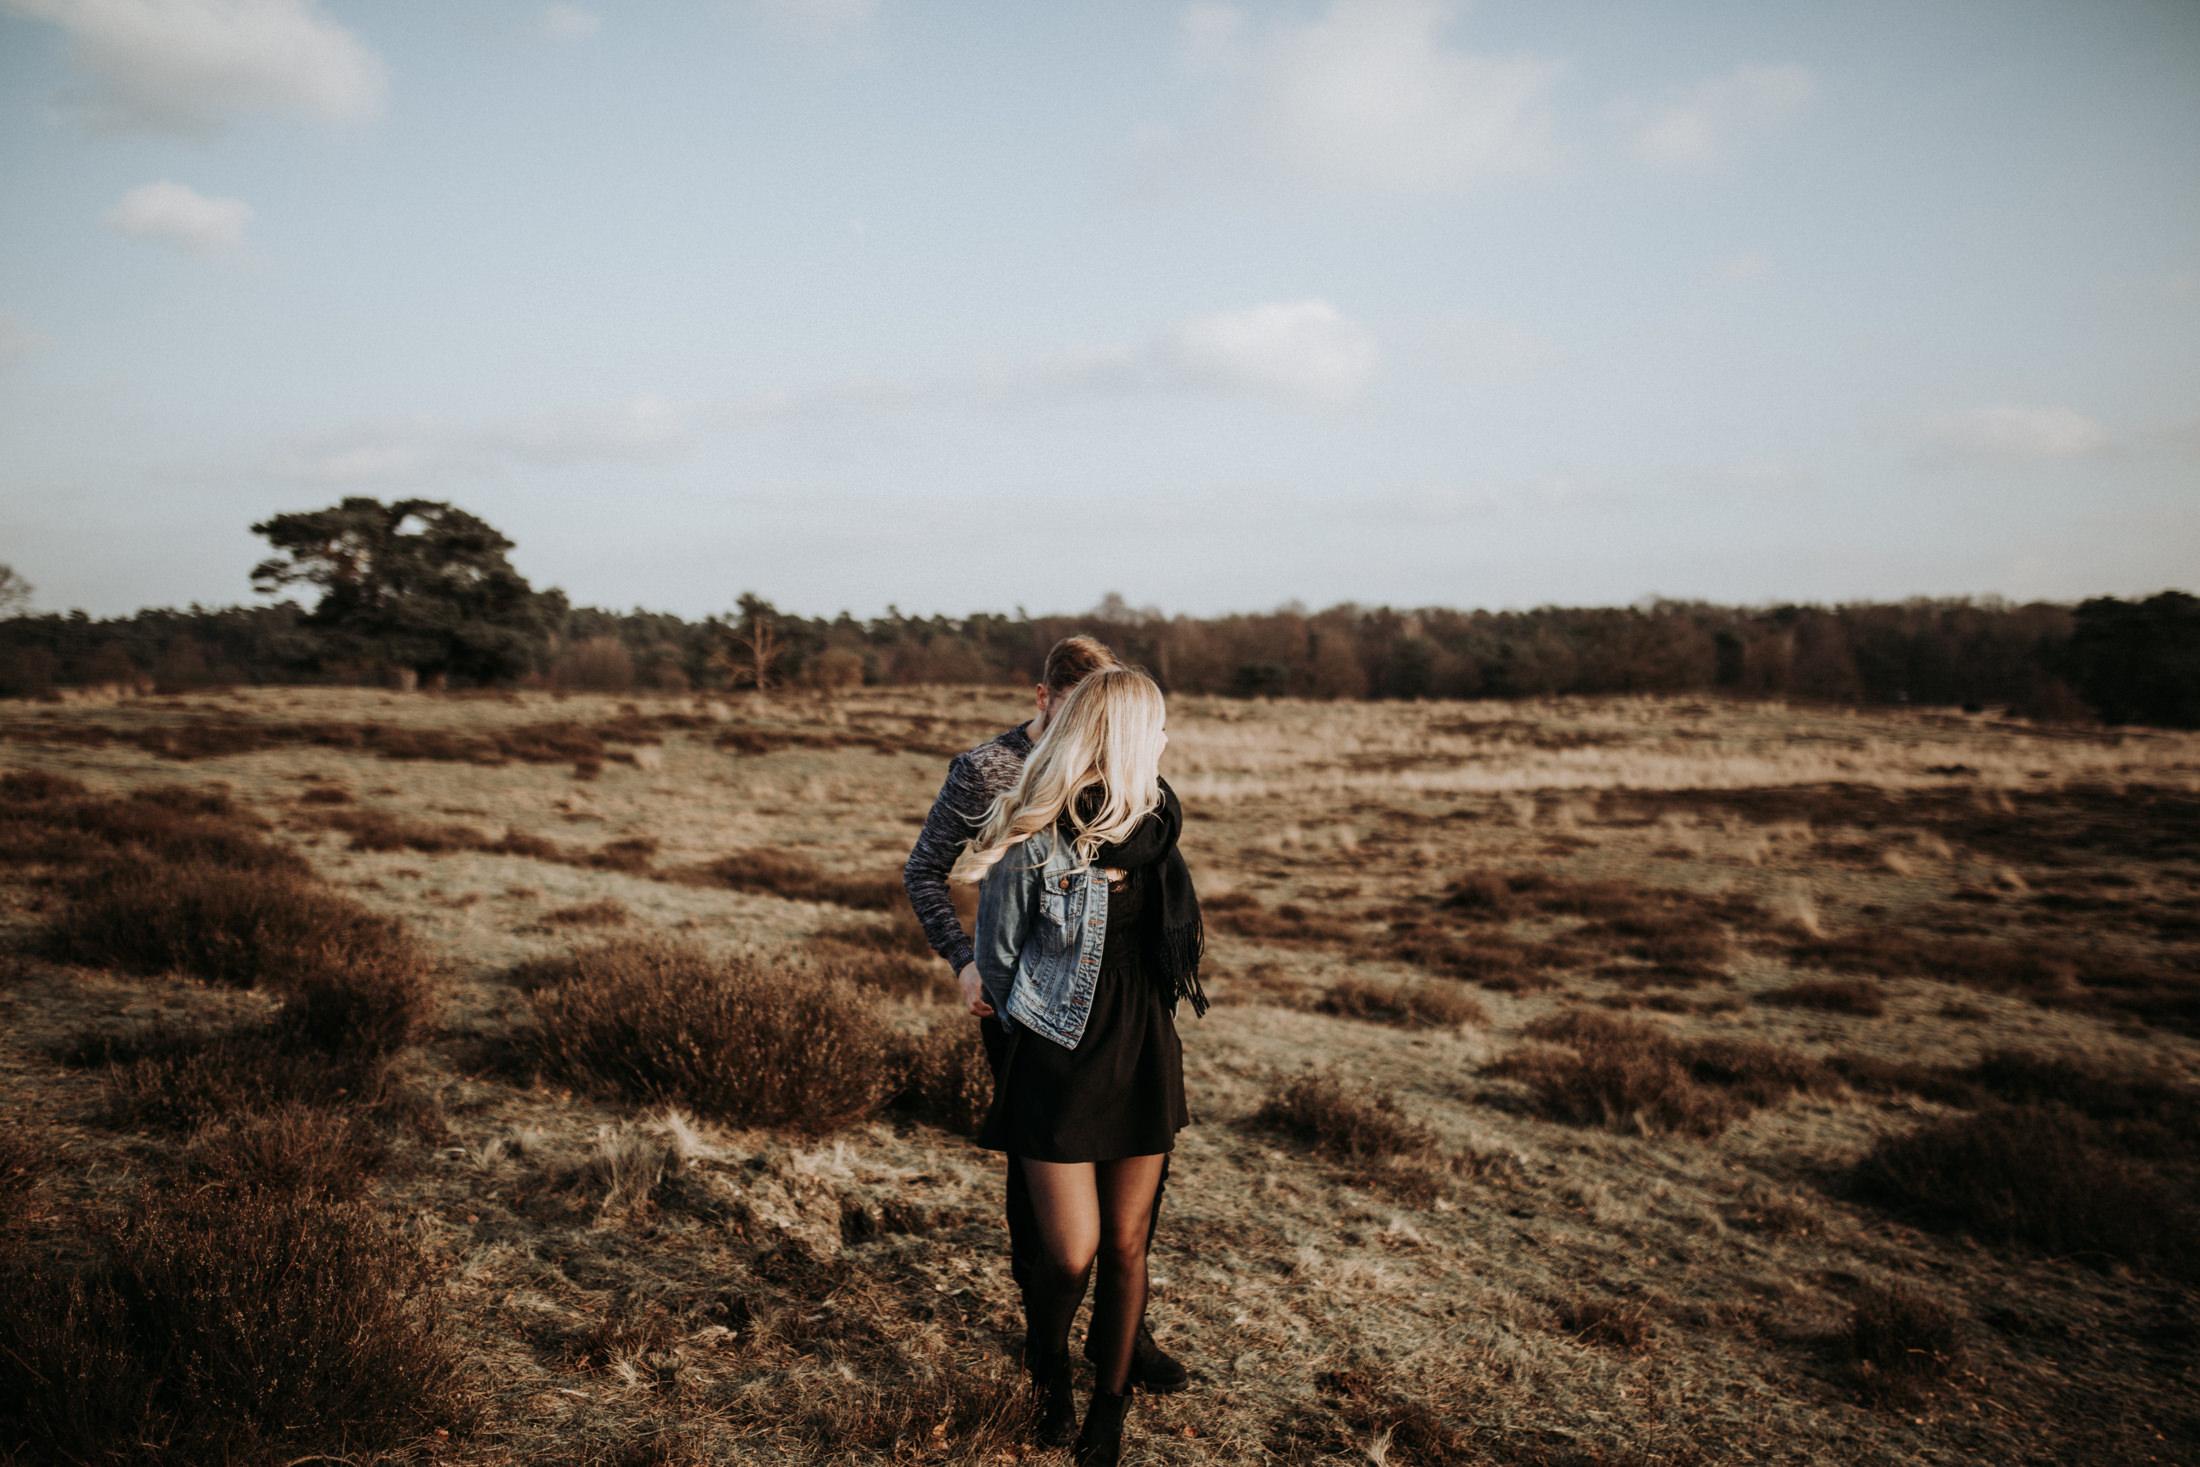 Wedding_Photographer_Mallorca_Daniela-Marquardt_Photography_CanaryIslands_Lanzarote_Iceland_Tuskany_Santorini_Portugal__Austria_Elopement_Hochzeitsfotograf_Milena_Marvin_11